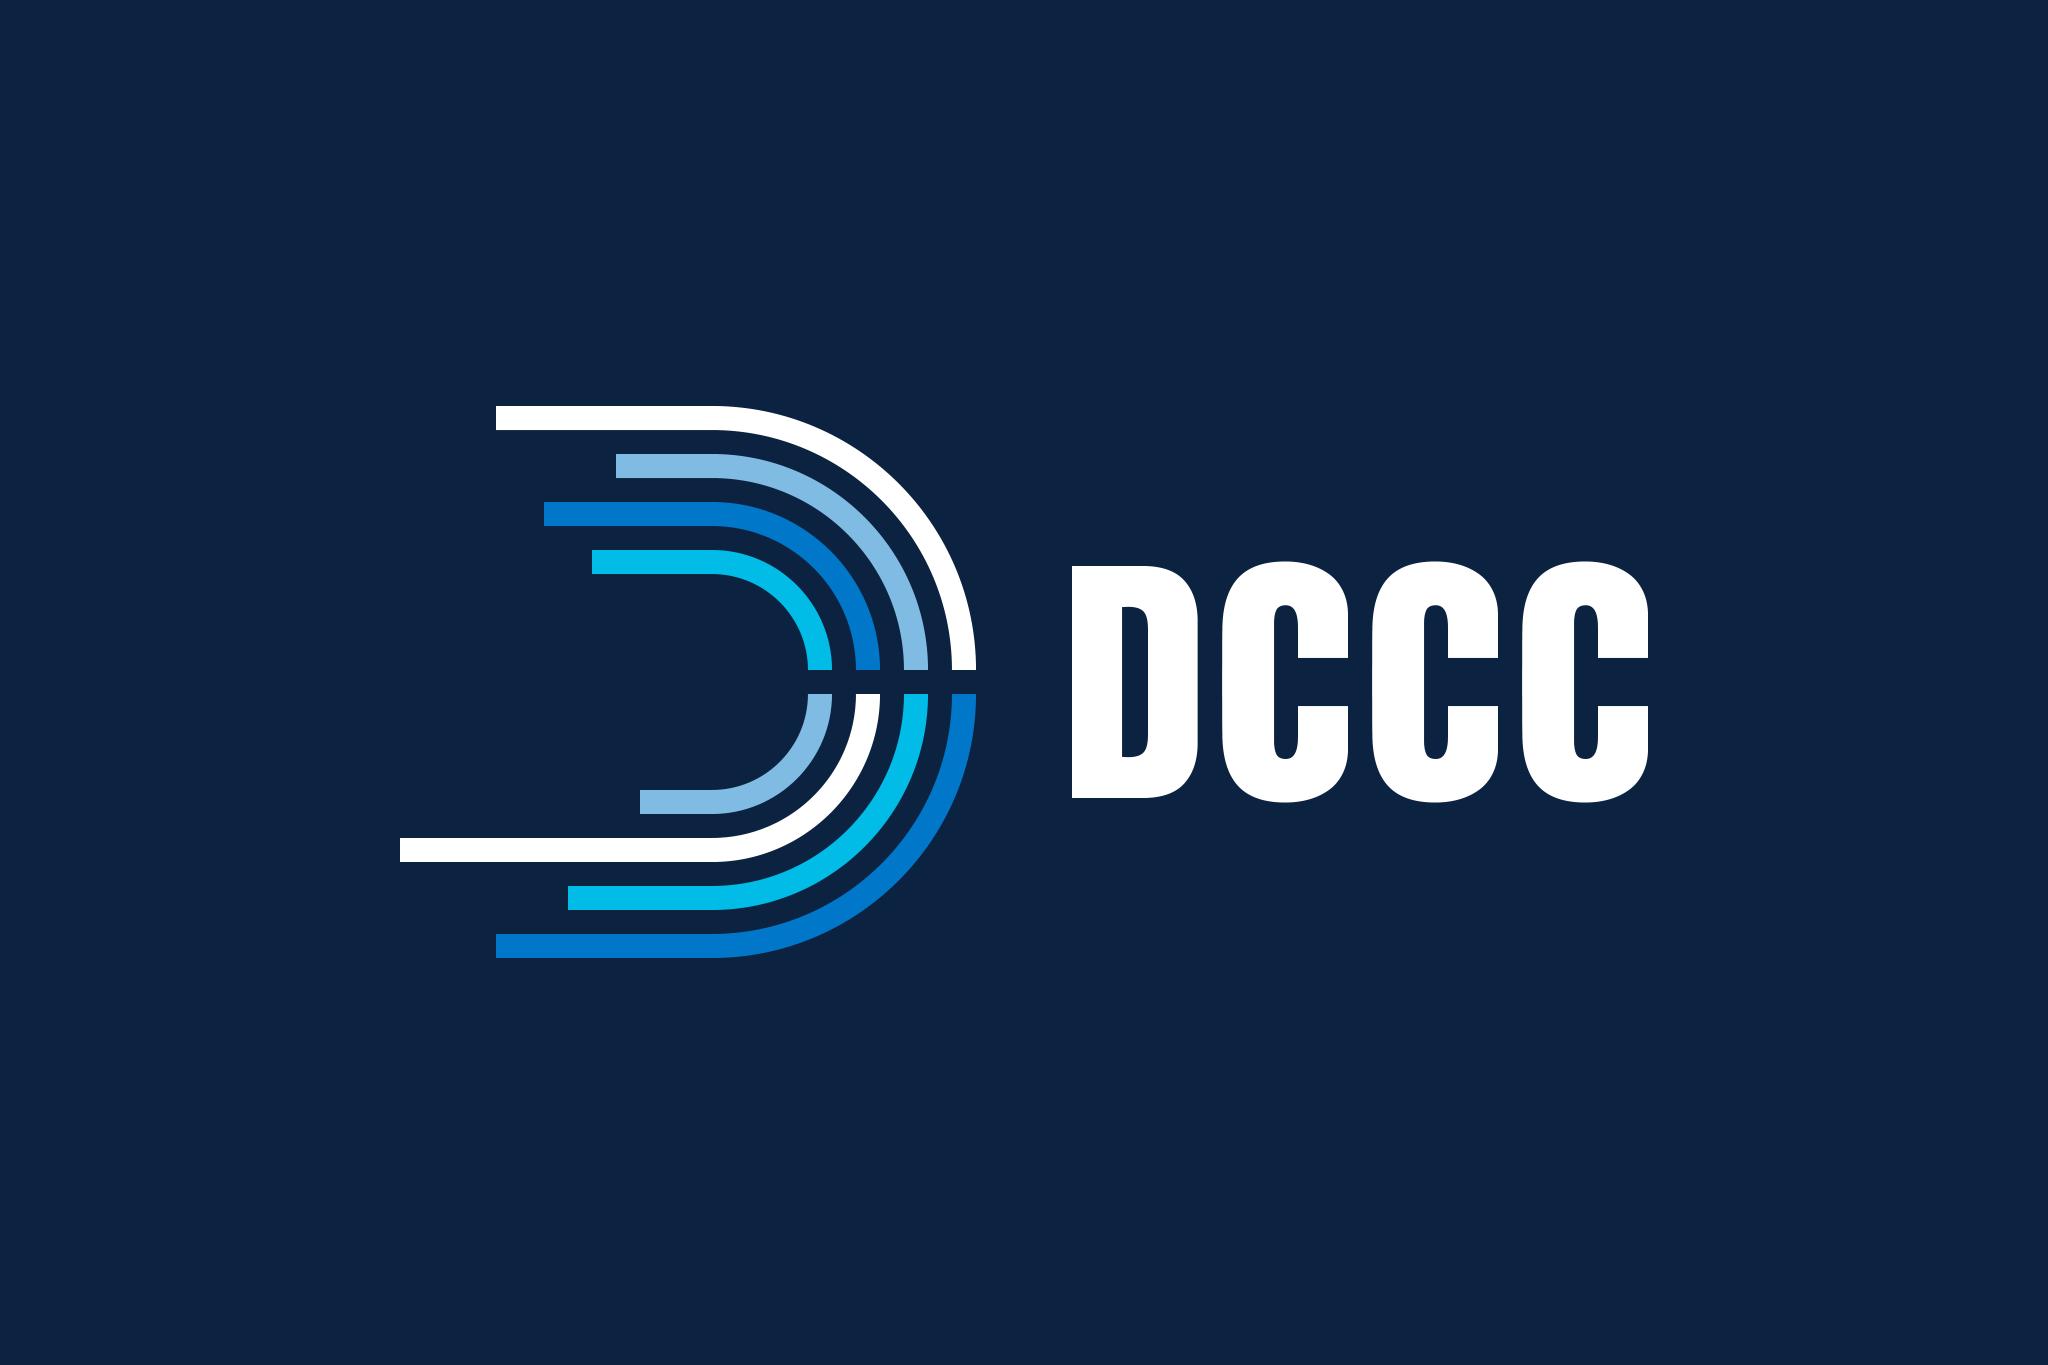 jkdc_dccc-logo.png